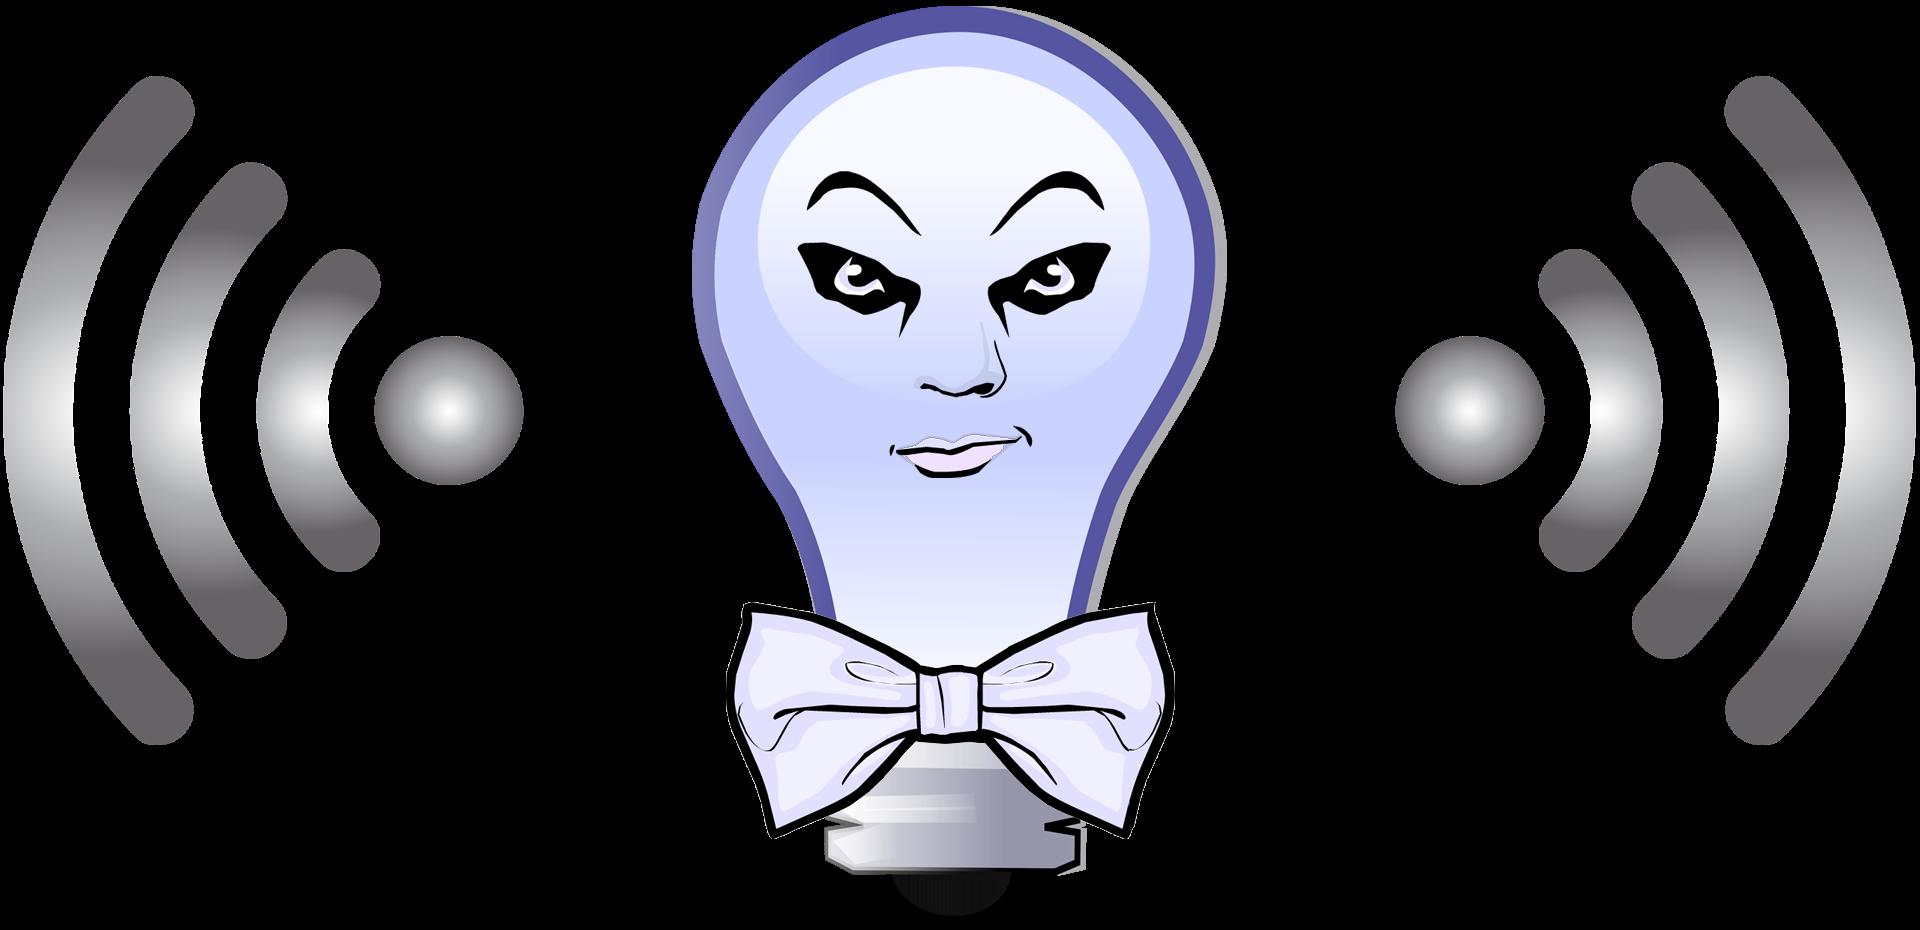 lightbulb clipart quick fact